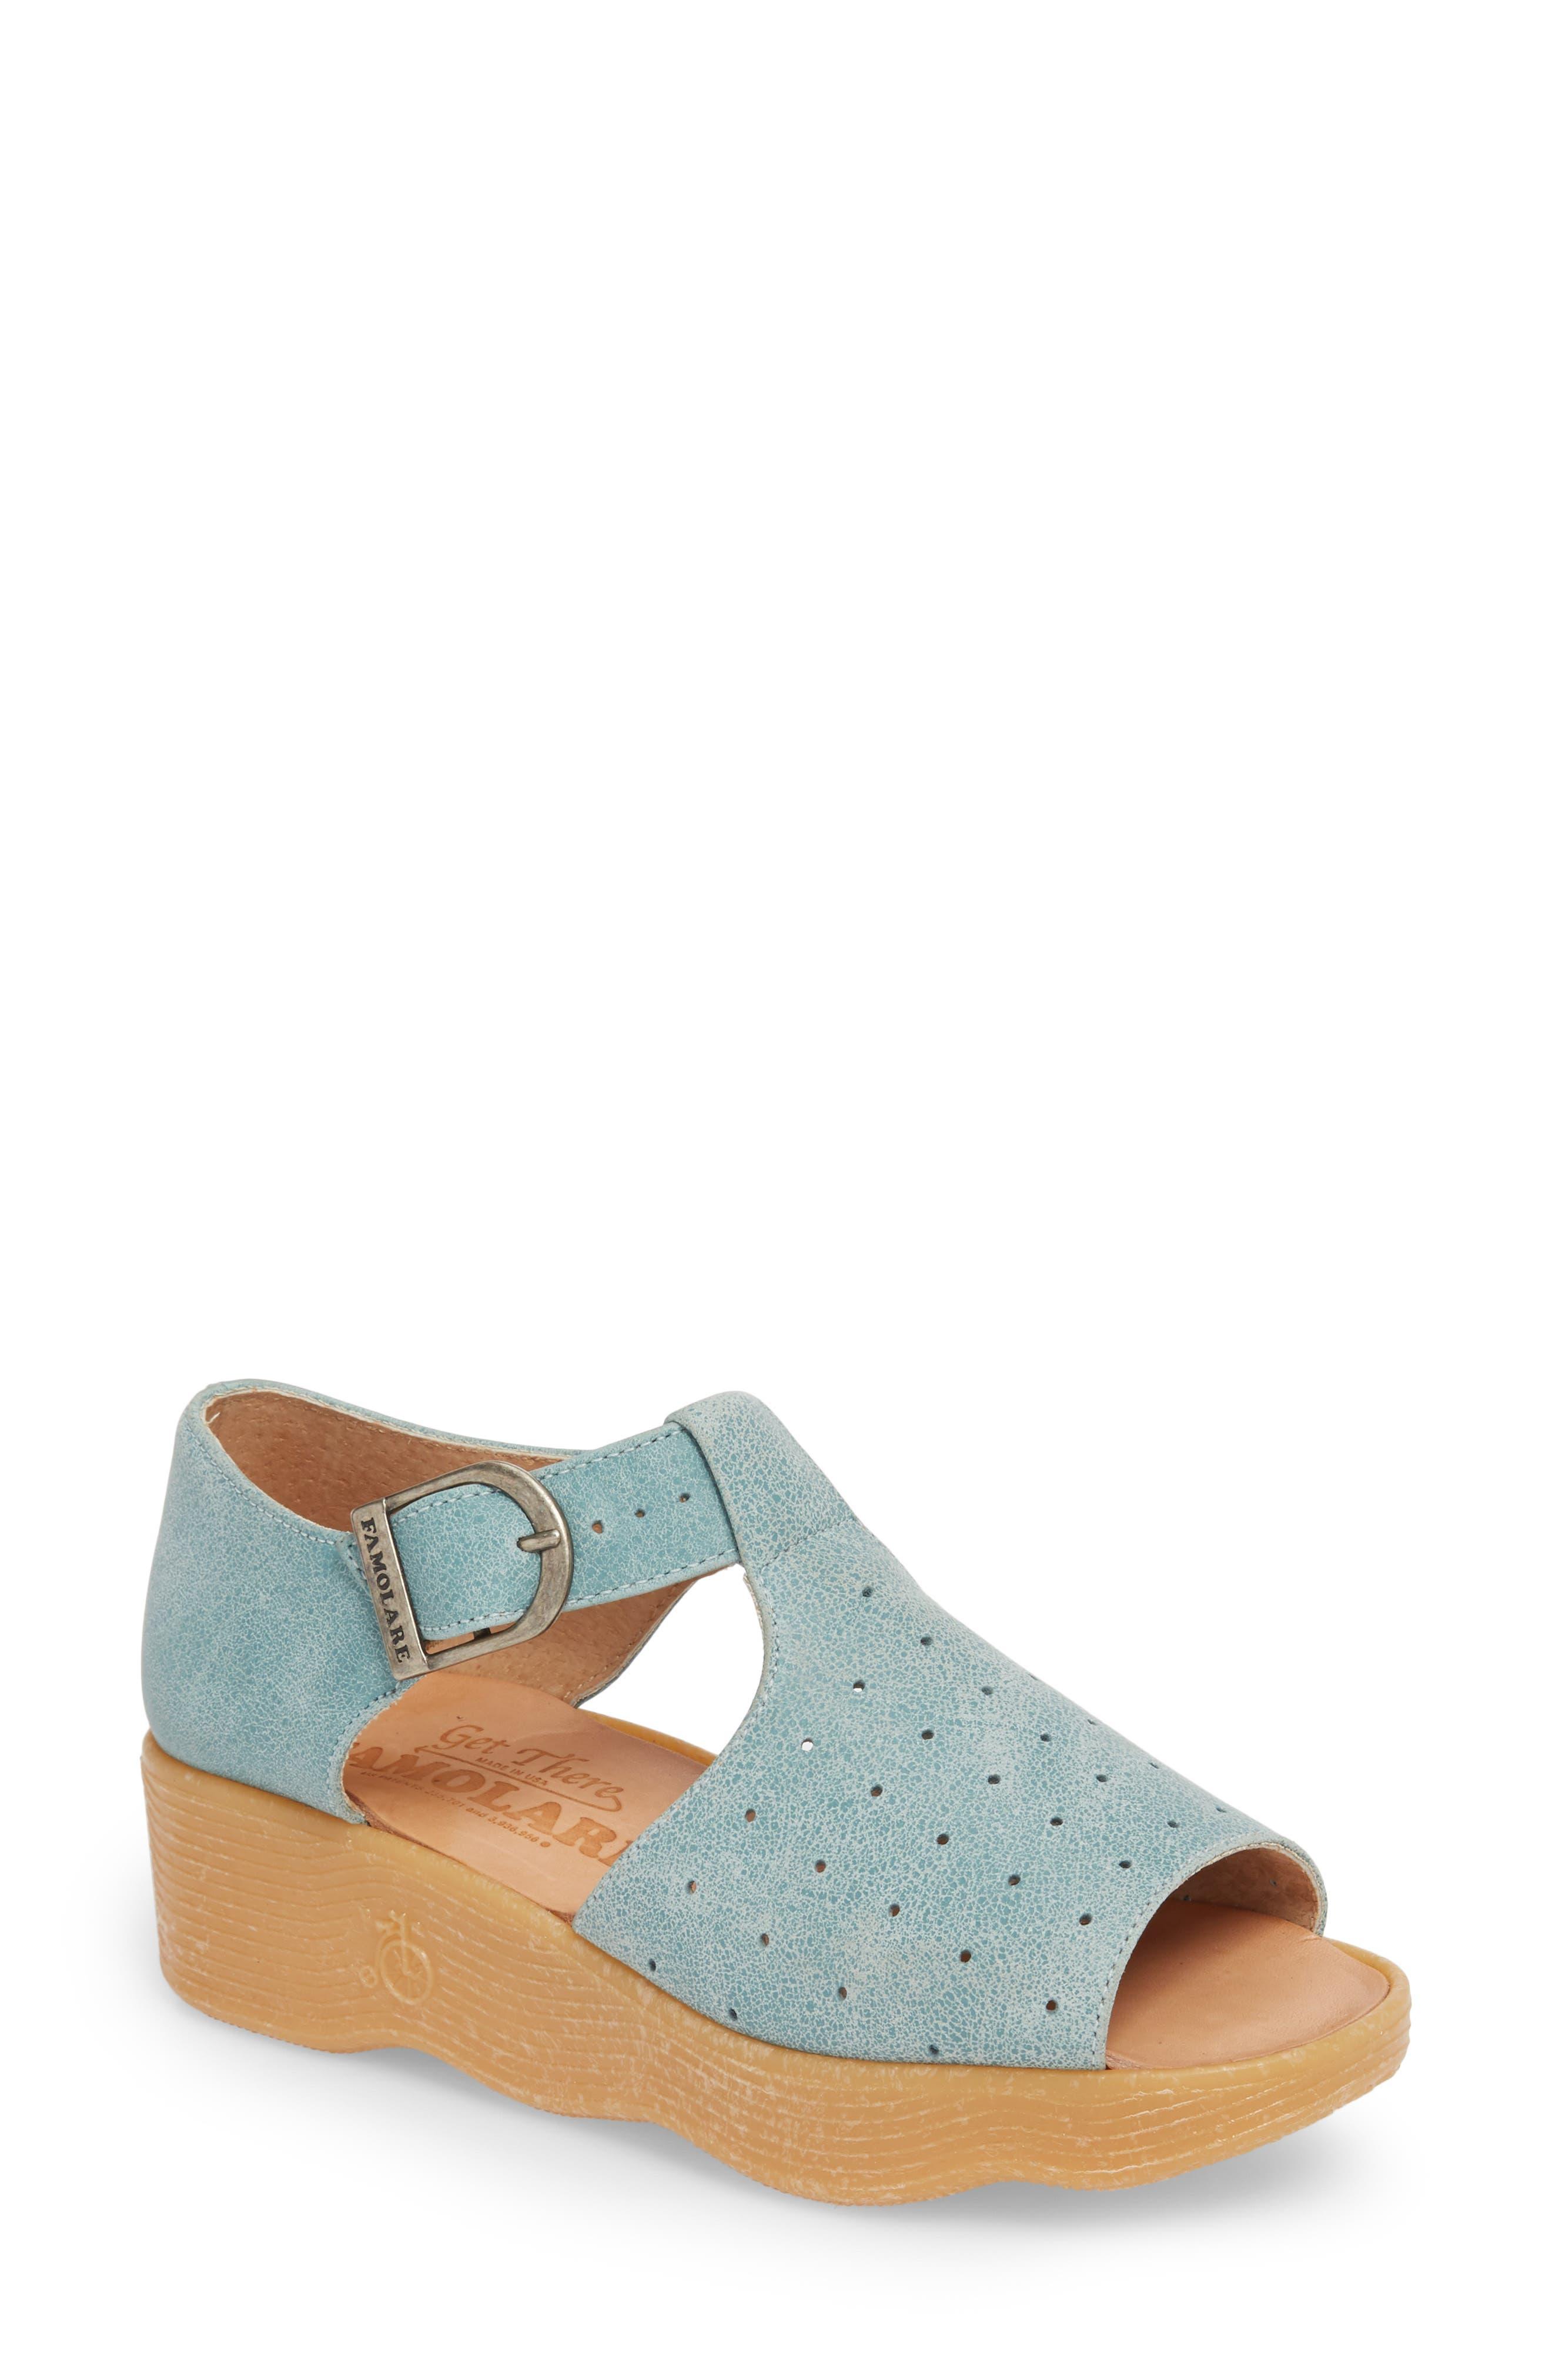 Famolare Holey Moley Wedge Sandal (Women)